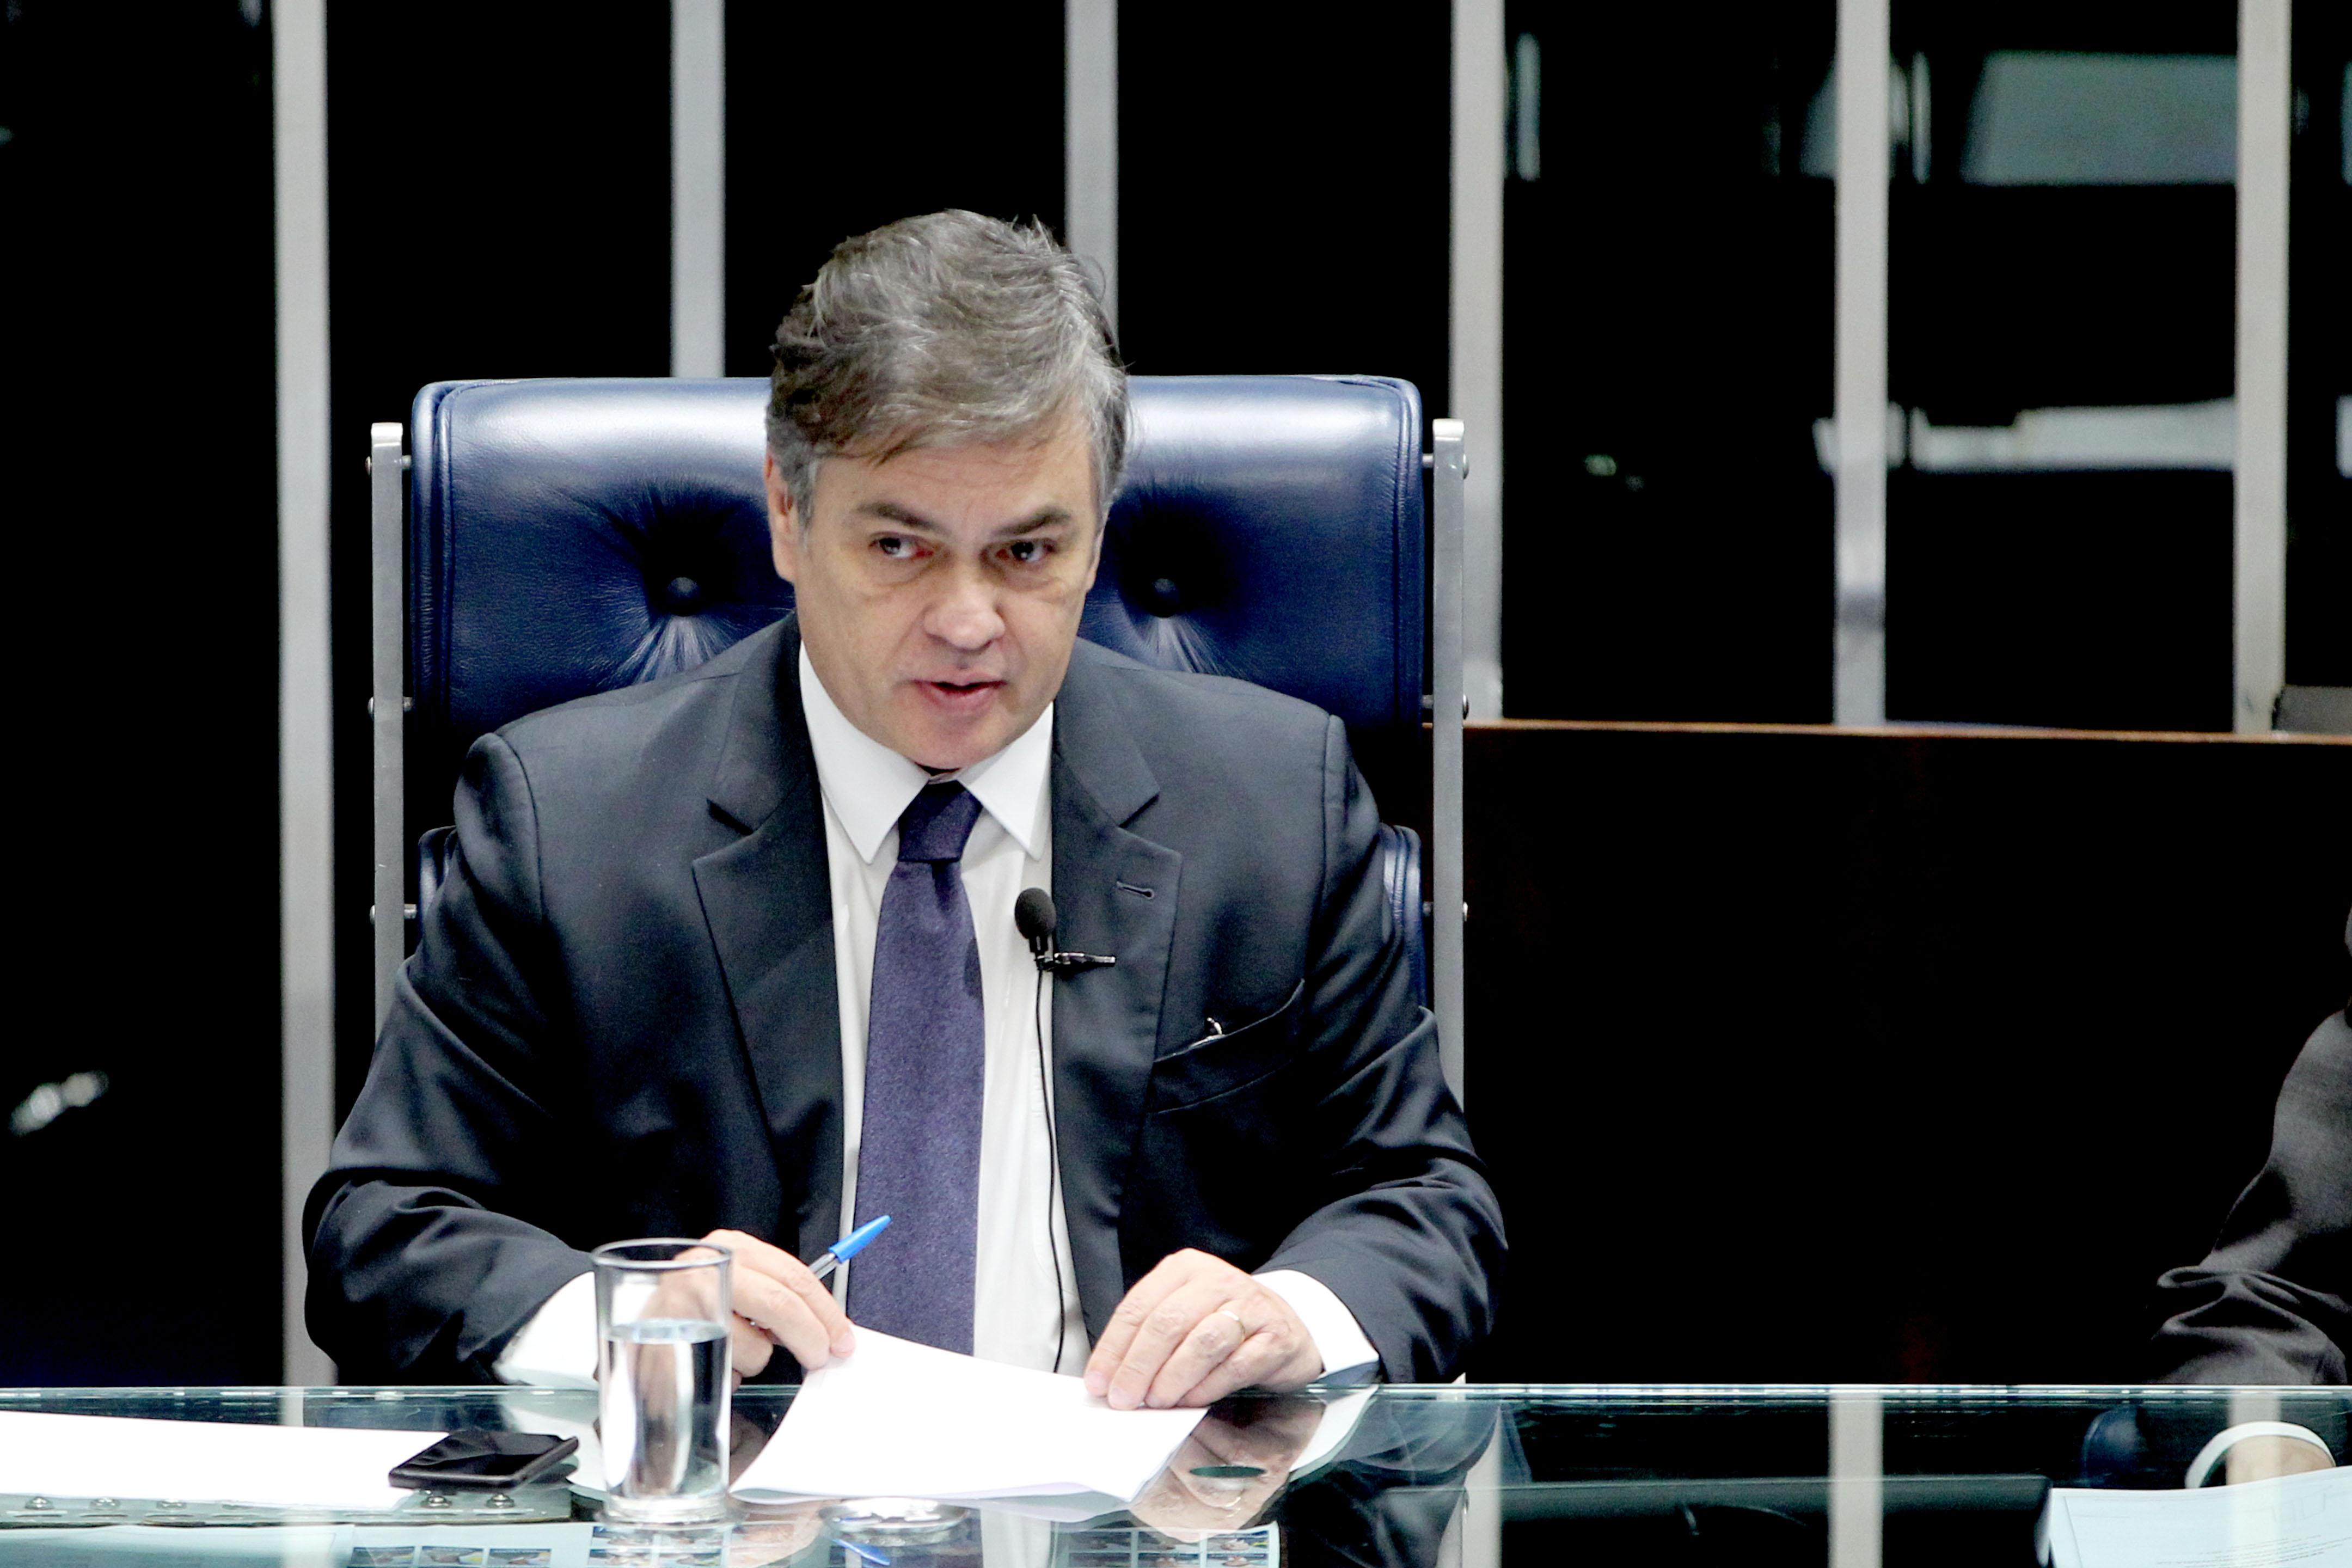 Exclusivo. Cássio Cunha Lima (PSDB) desmente Tovar Correia Lima (PSDB) e diz que a chance é zero de presidir o novo partido do presidente Jair Bolsonaro na Paraíba.